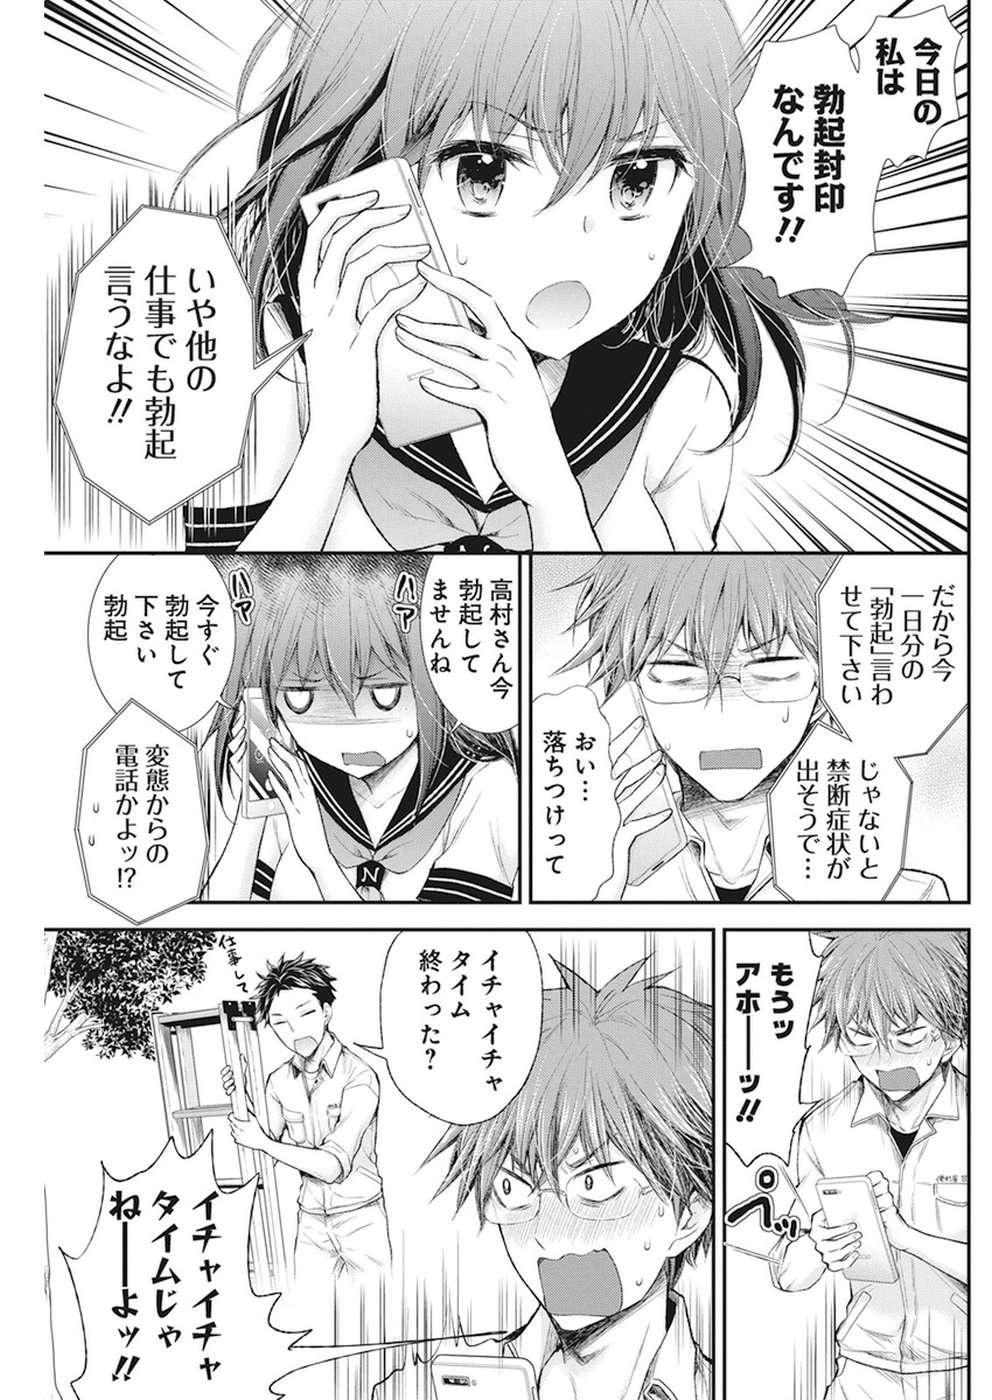 Henjyo - Hen na Jyoshi Kousei Amaguri Senko - Raw Chapter 68 - RawQQ.Com